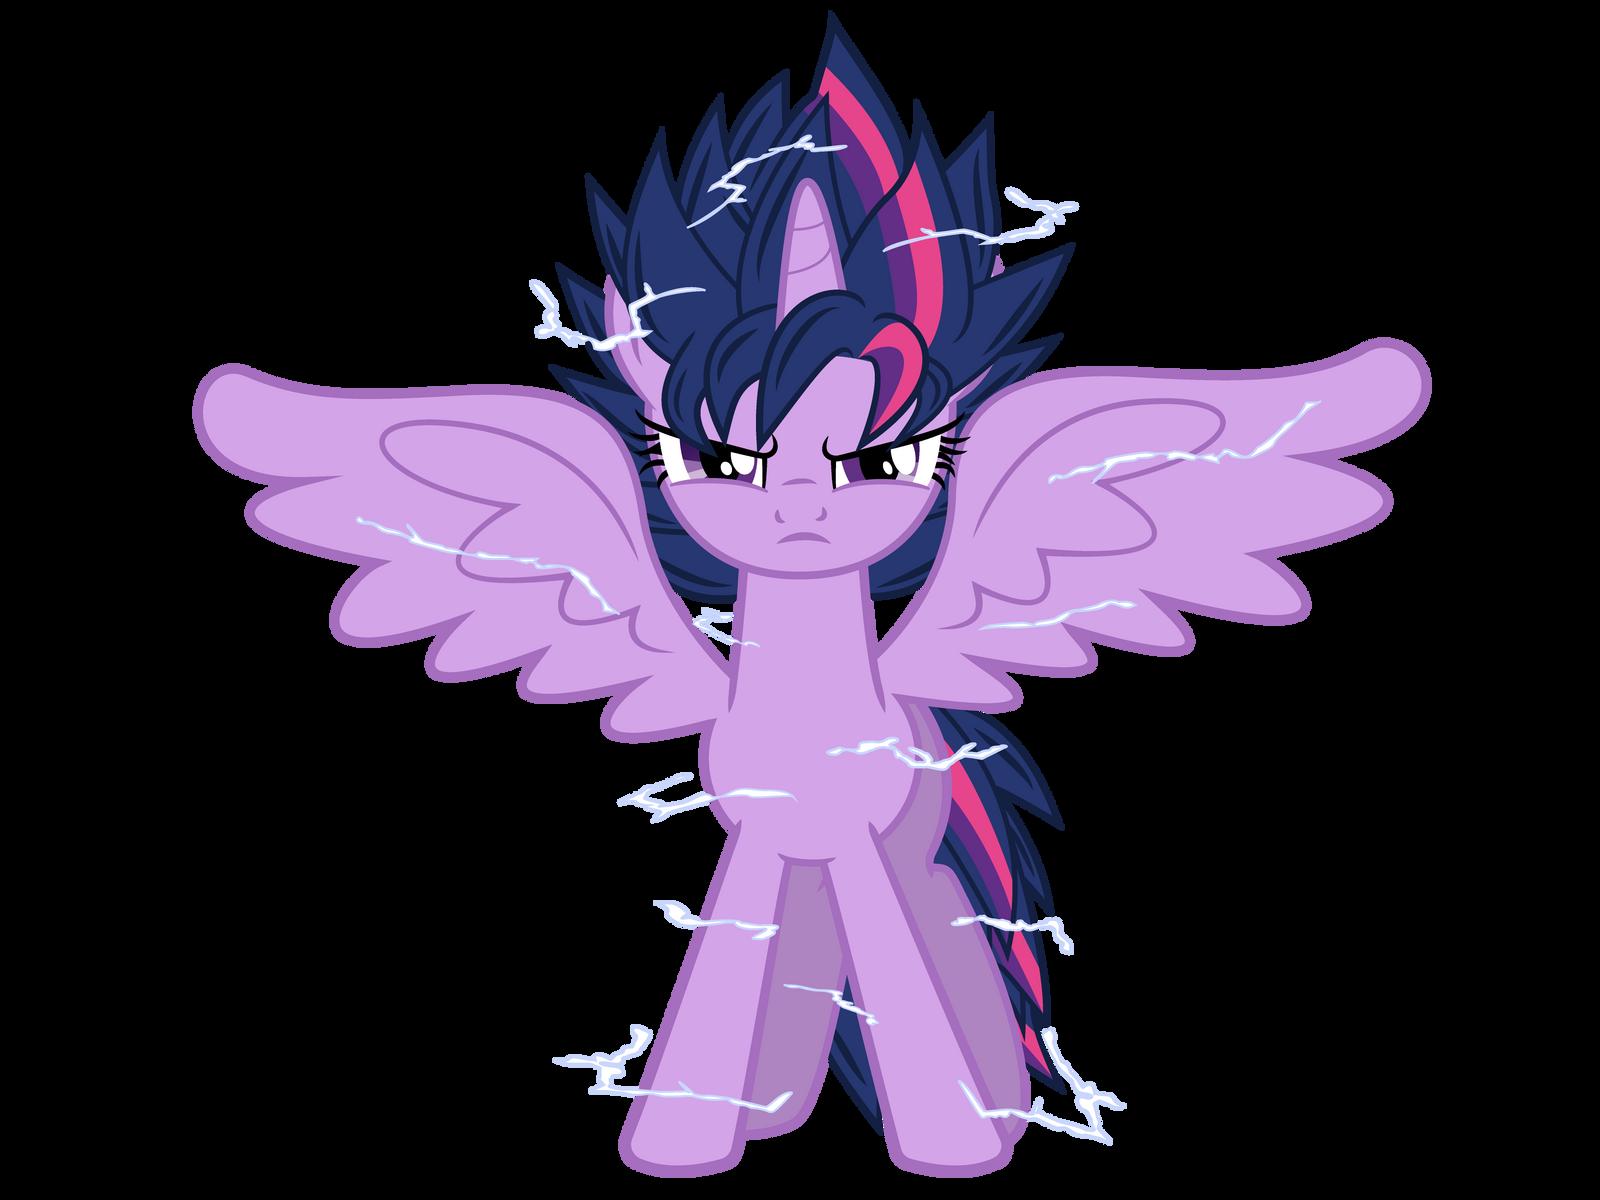 Twilight Sparkles Half Pony Form In My Little Pony Equestria Girls